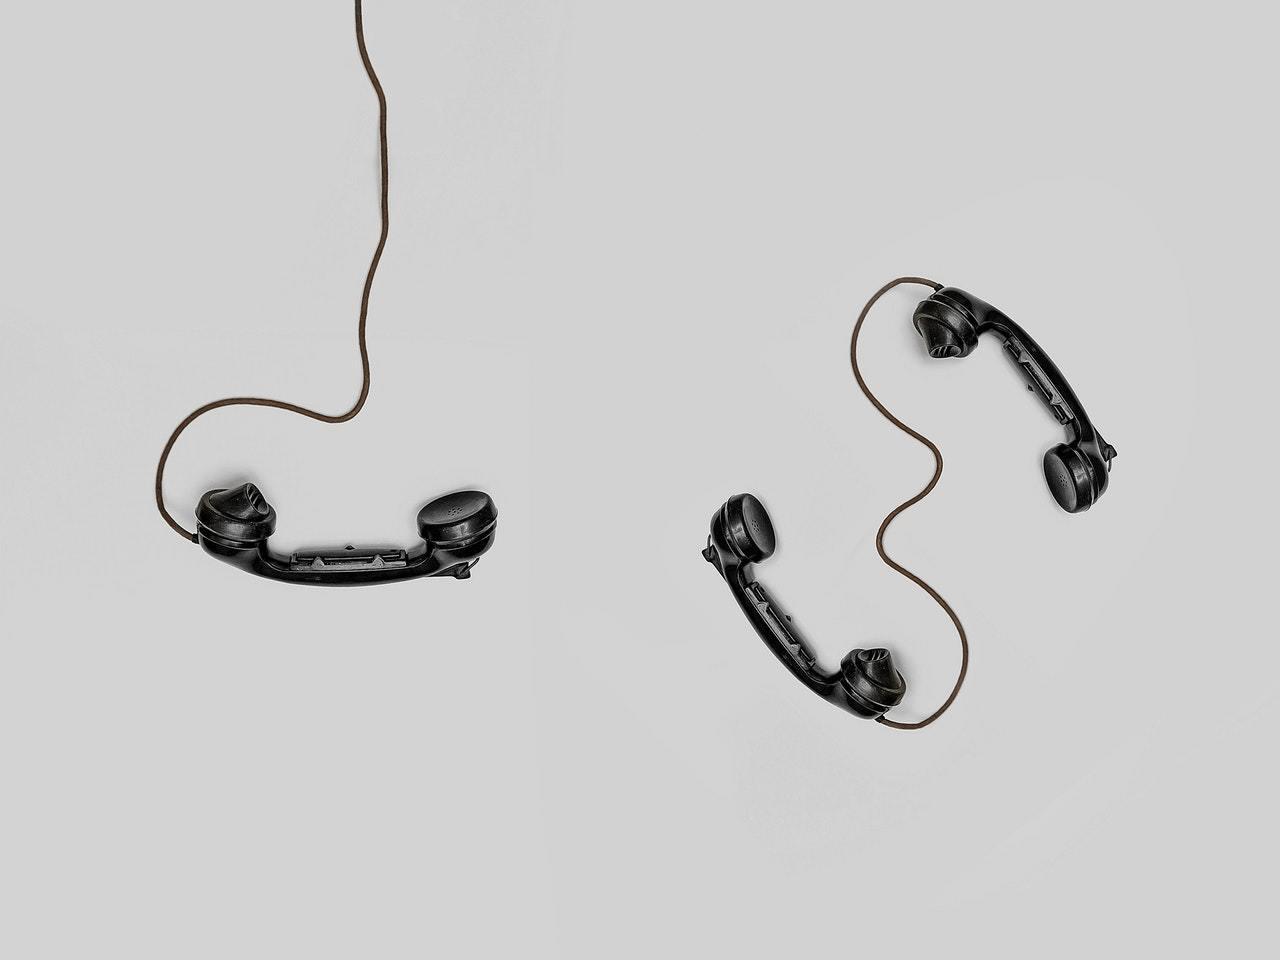 Three black handset toys 821754